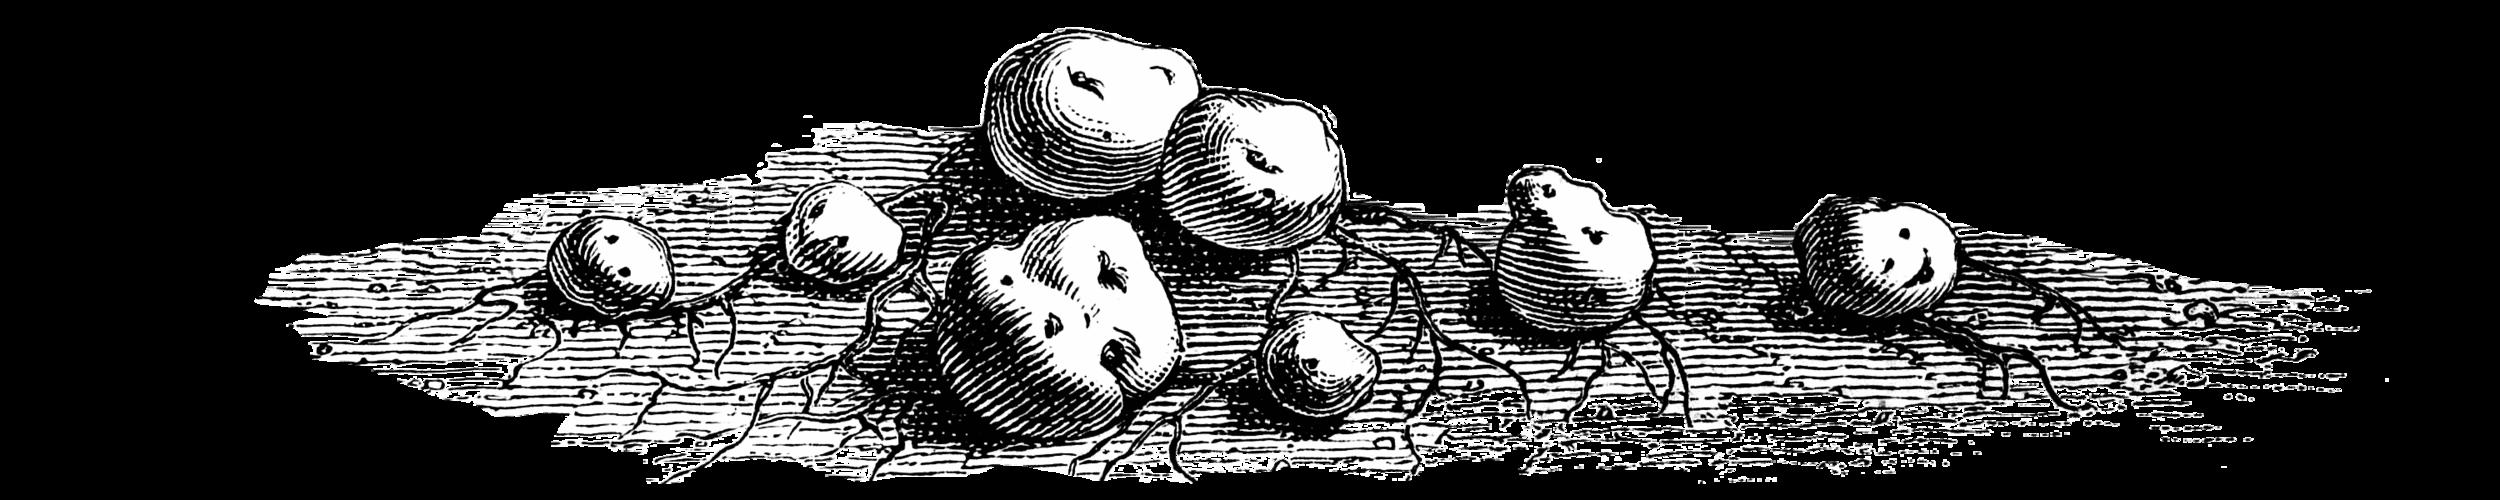 potatoes2.png